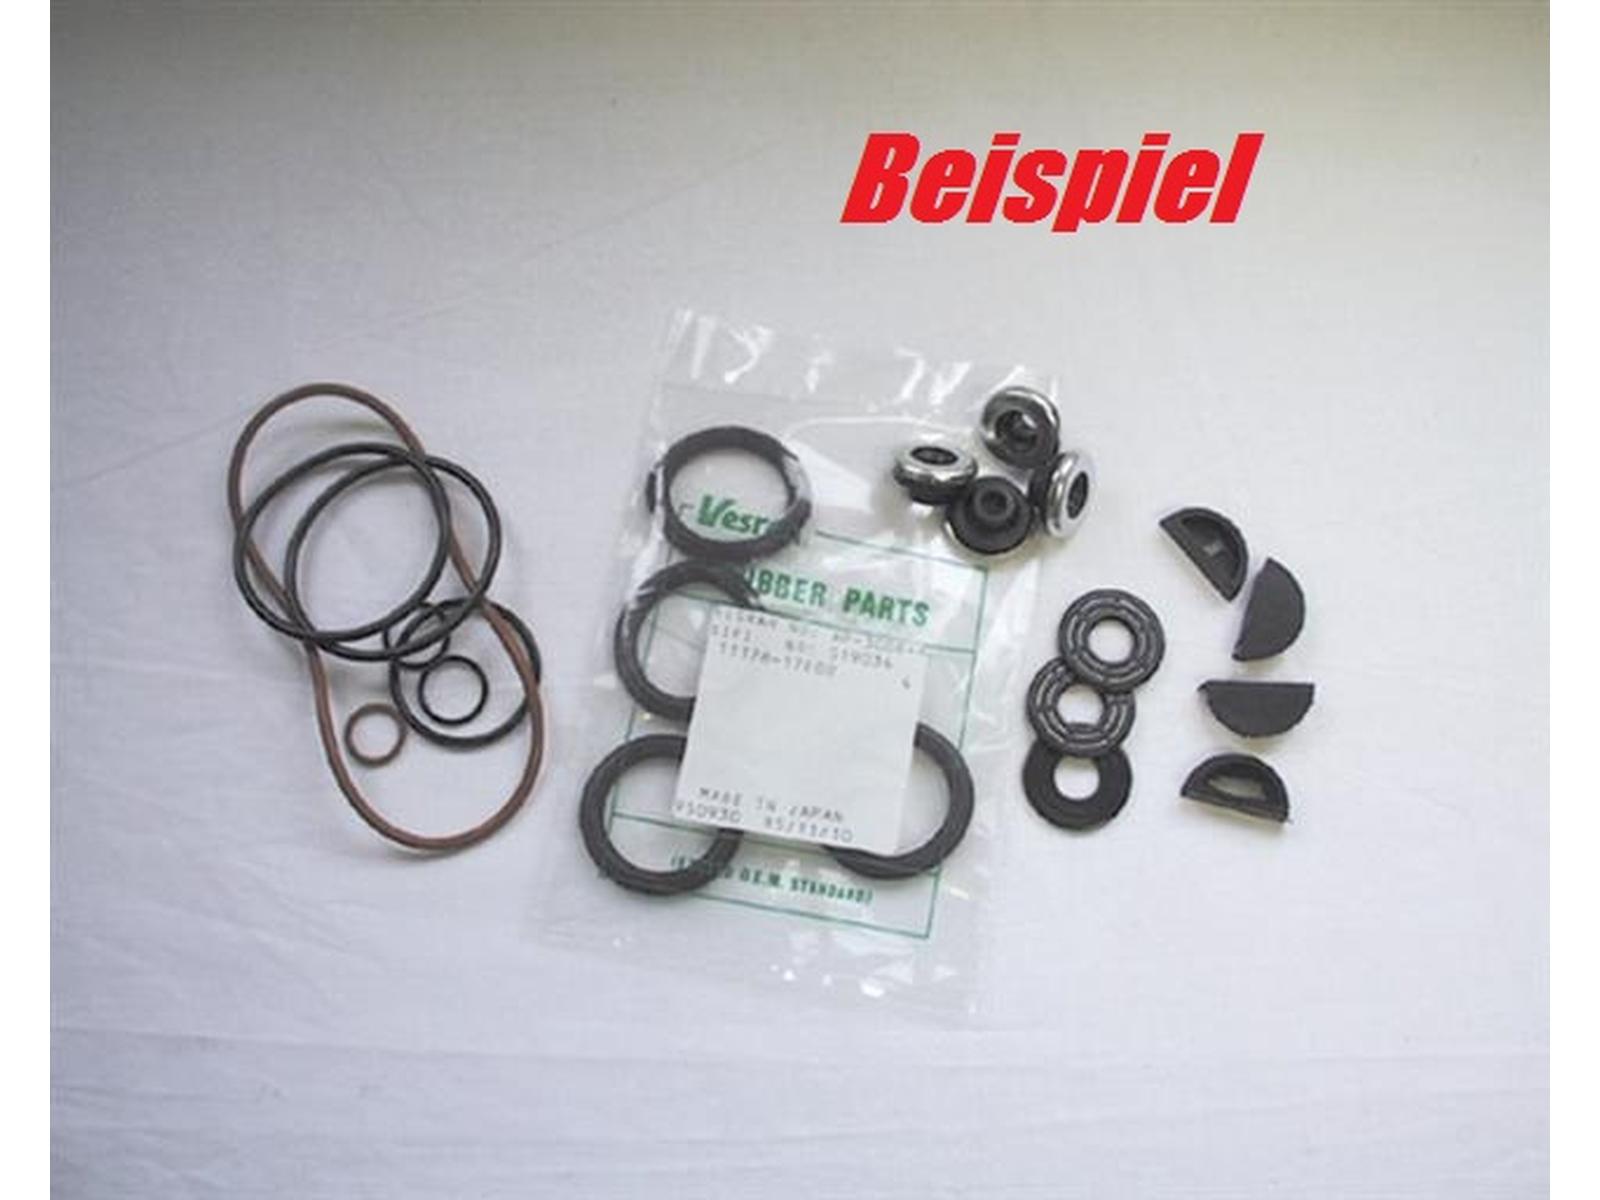 Ventildeckeldichtung Kawasaki Gpz750/900/1000R/Rx